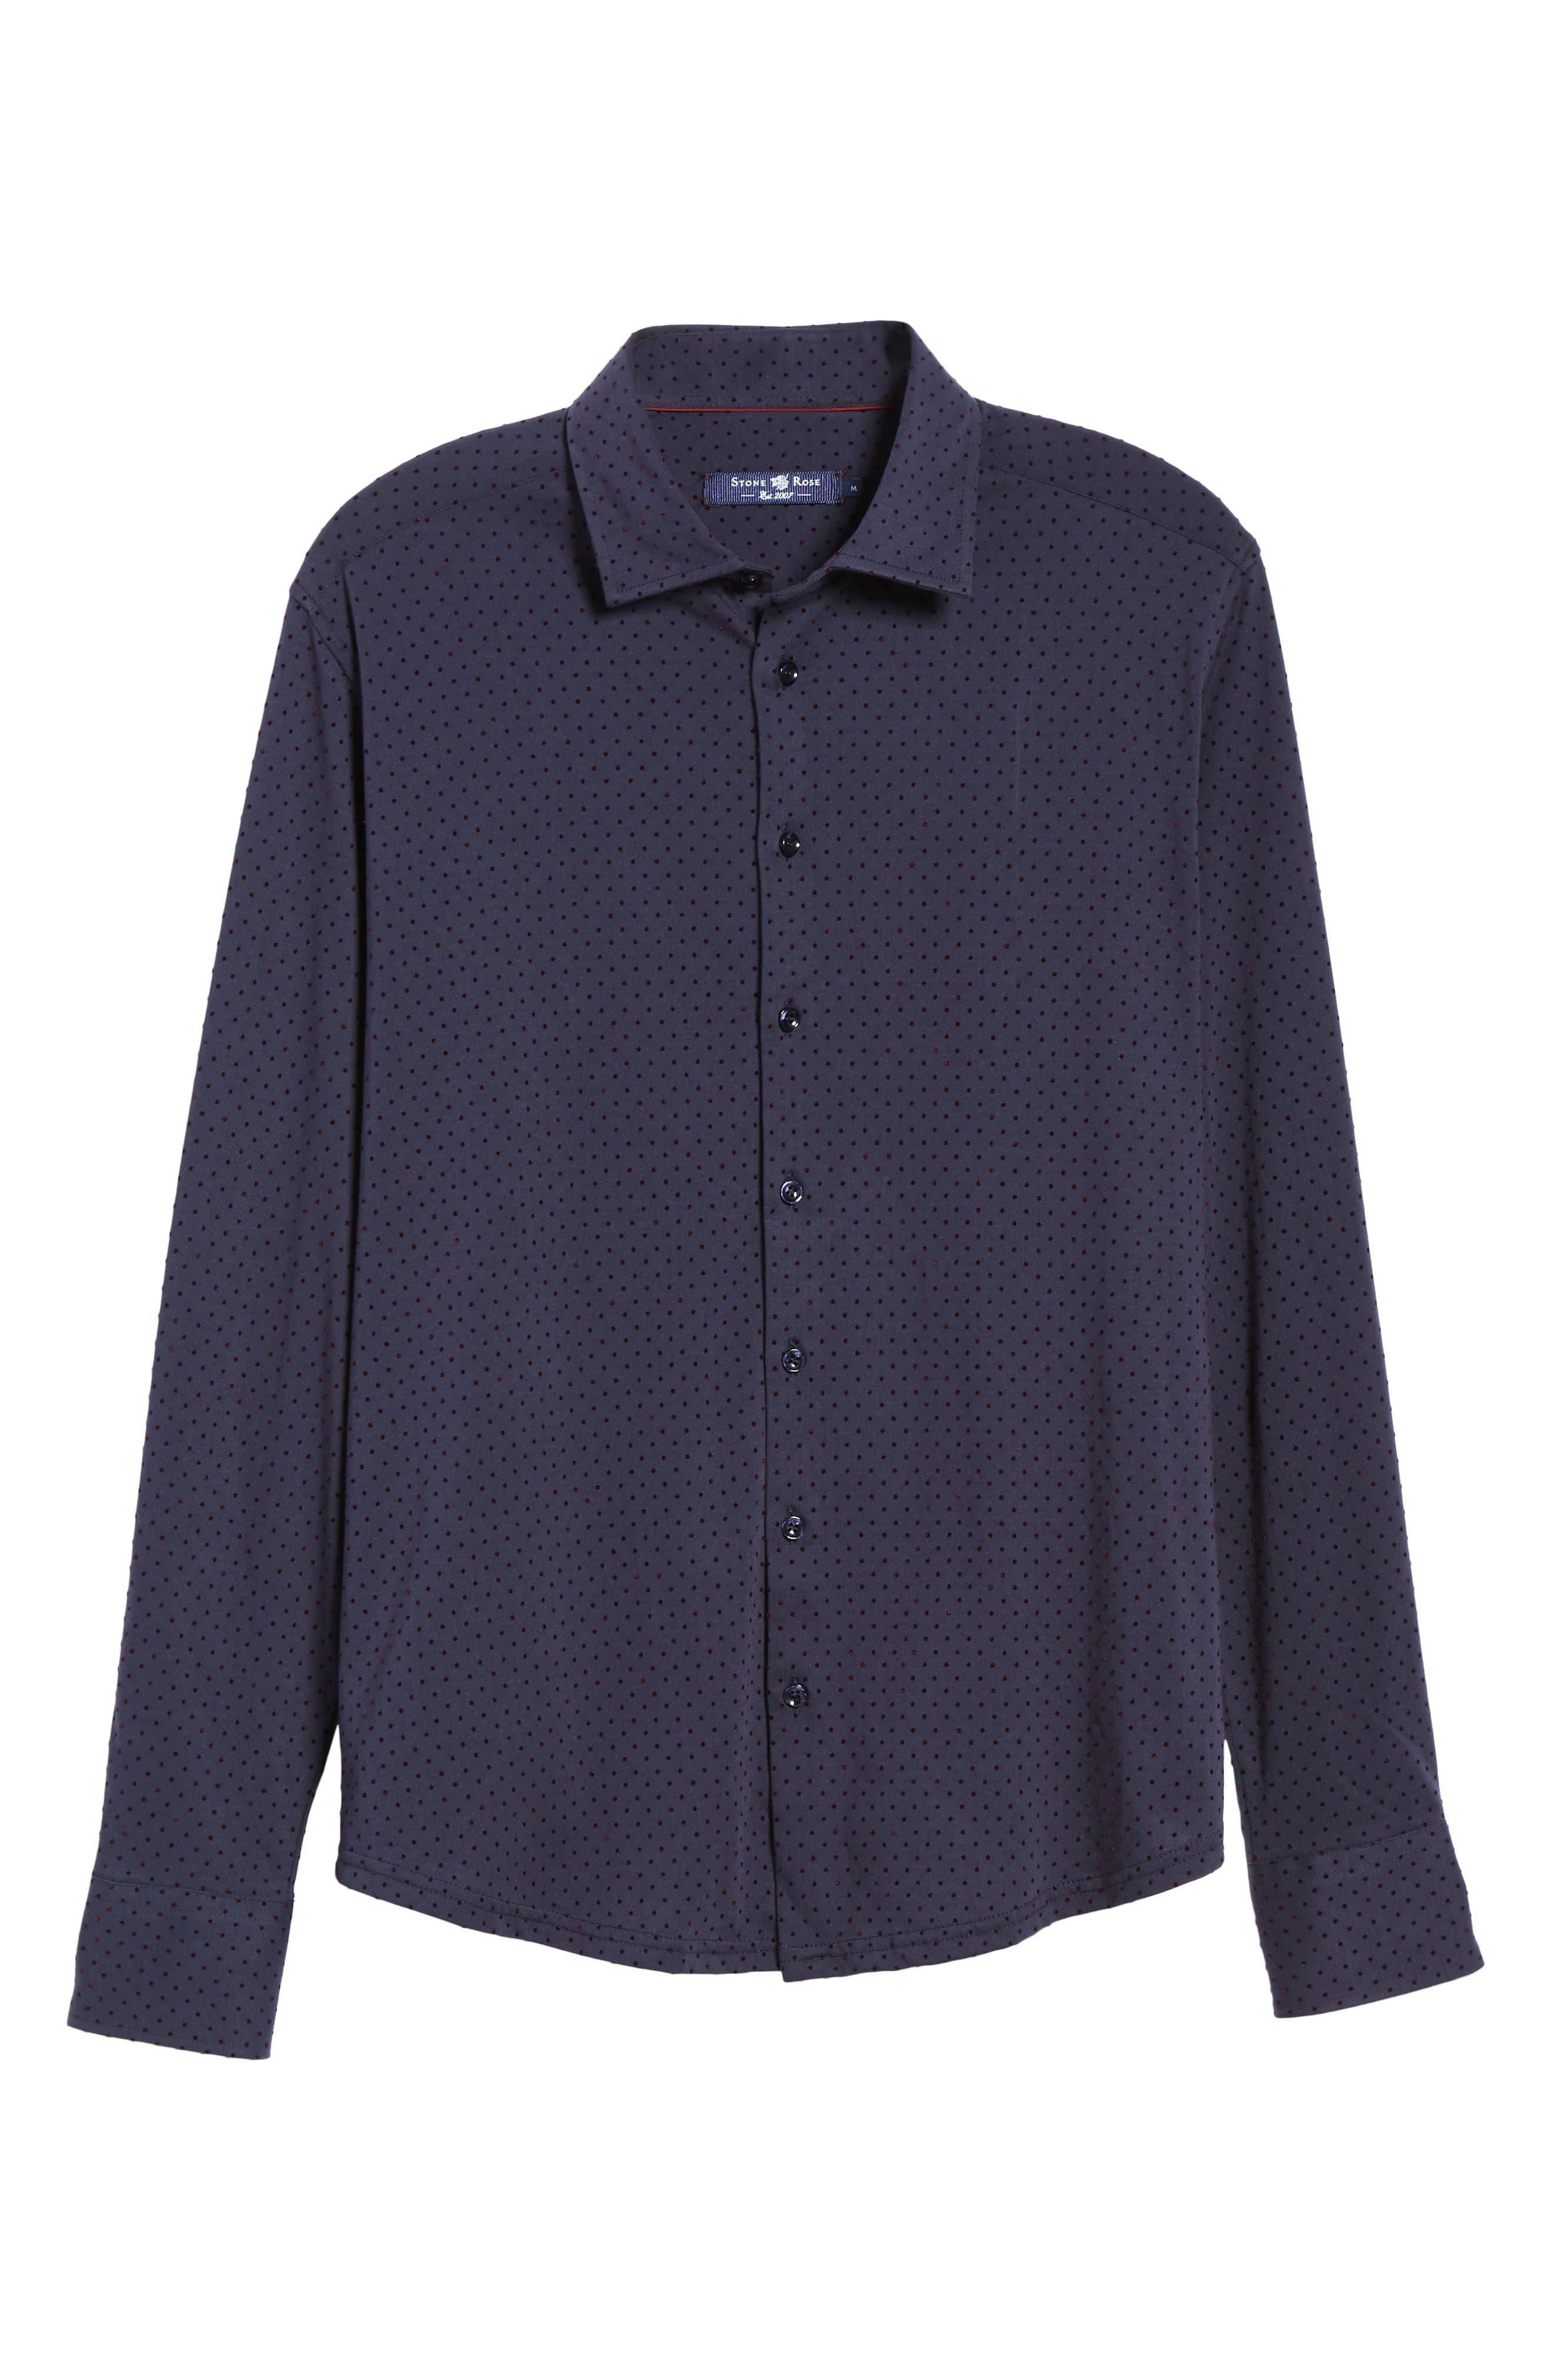 STONE ROSE,                             Regular Fit Knit Sport Shirt,                             Alternate thumbnail 5, color,                             NAVY